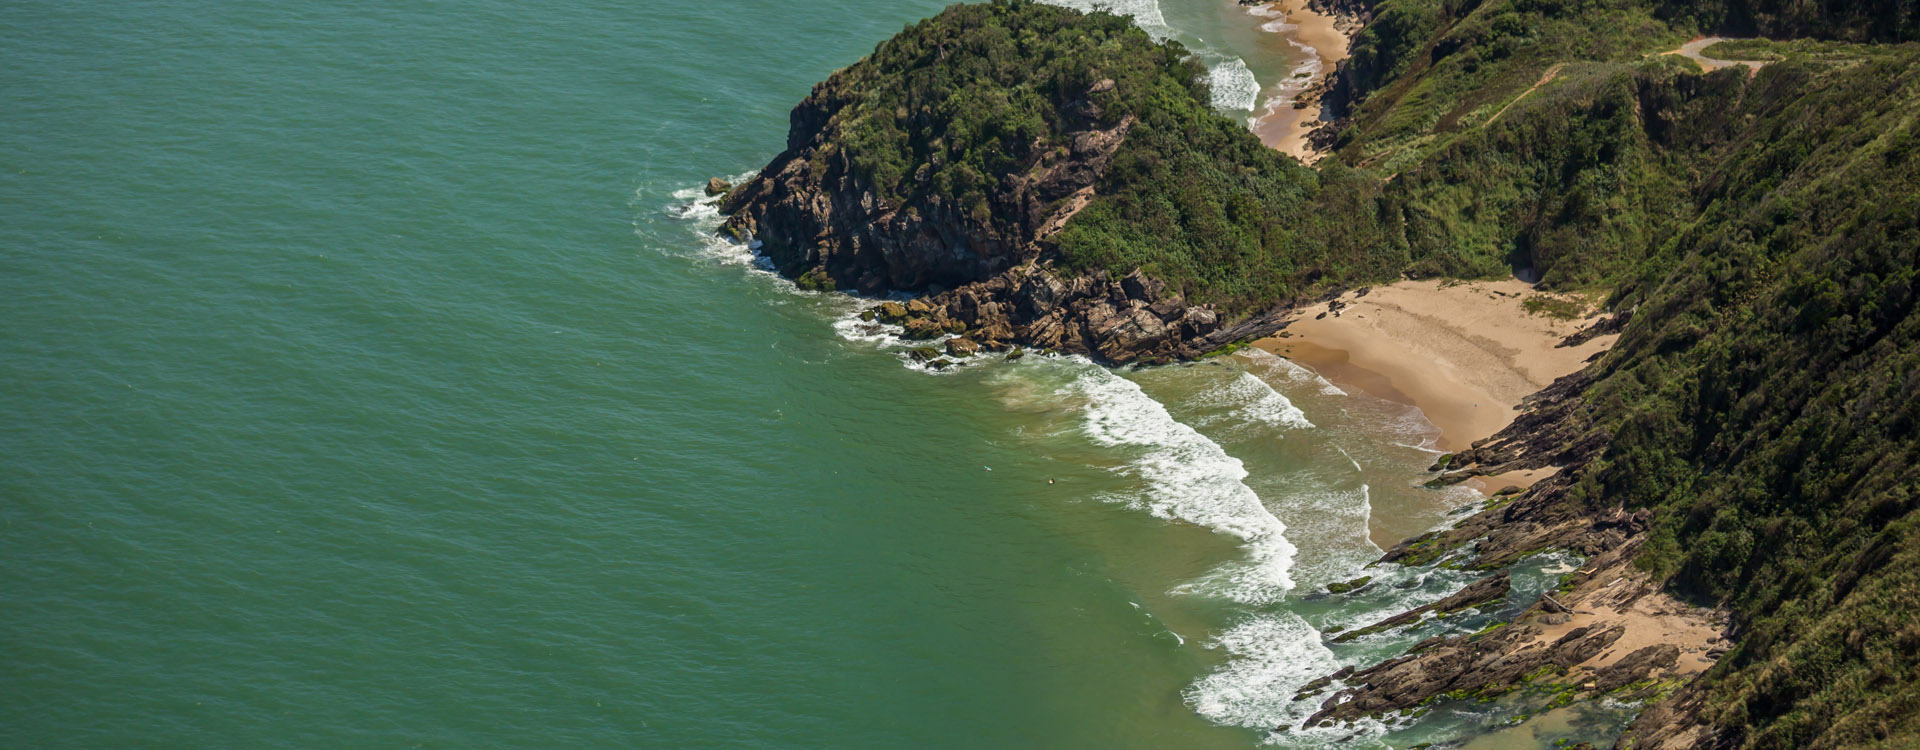 costa-verde-mar-guia-apino